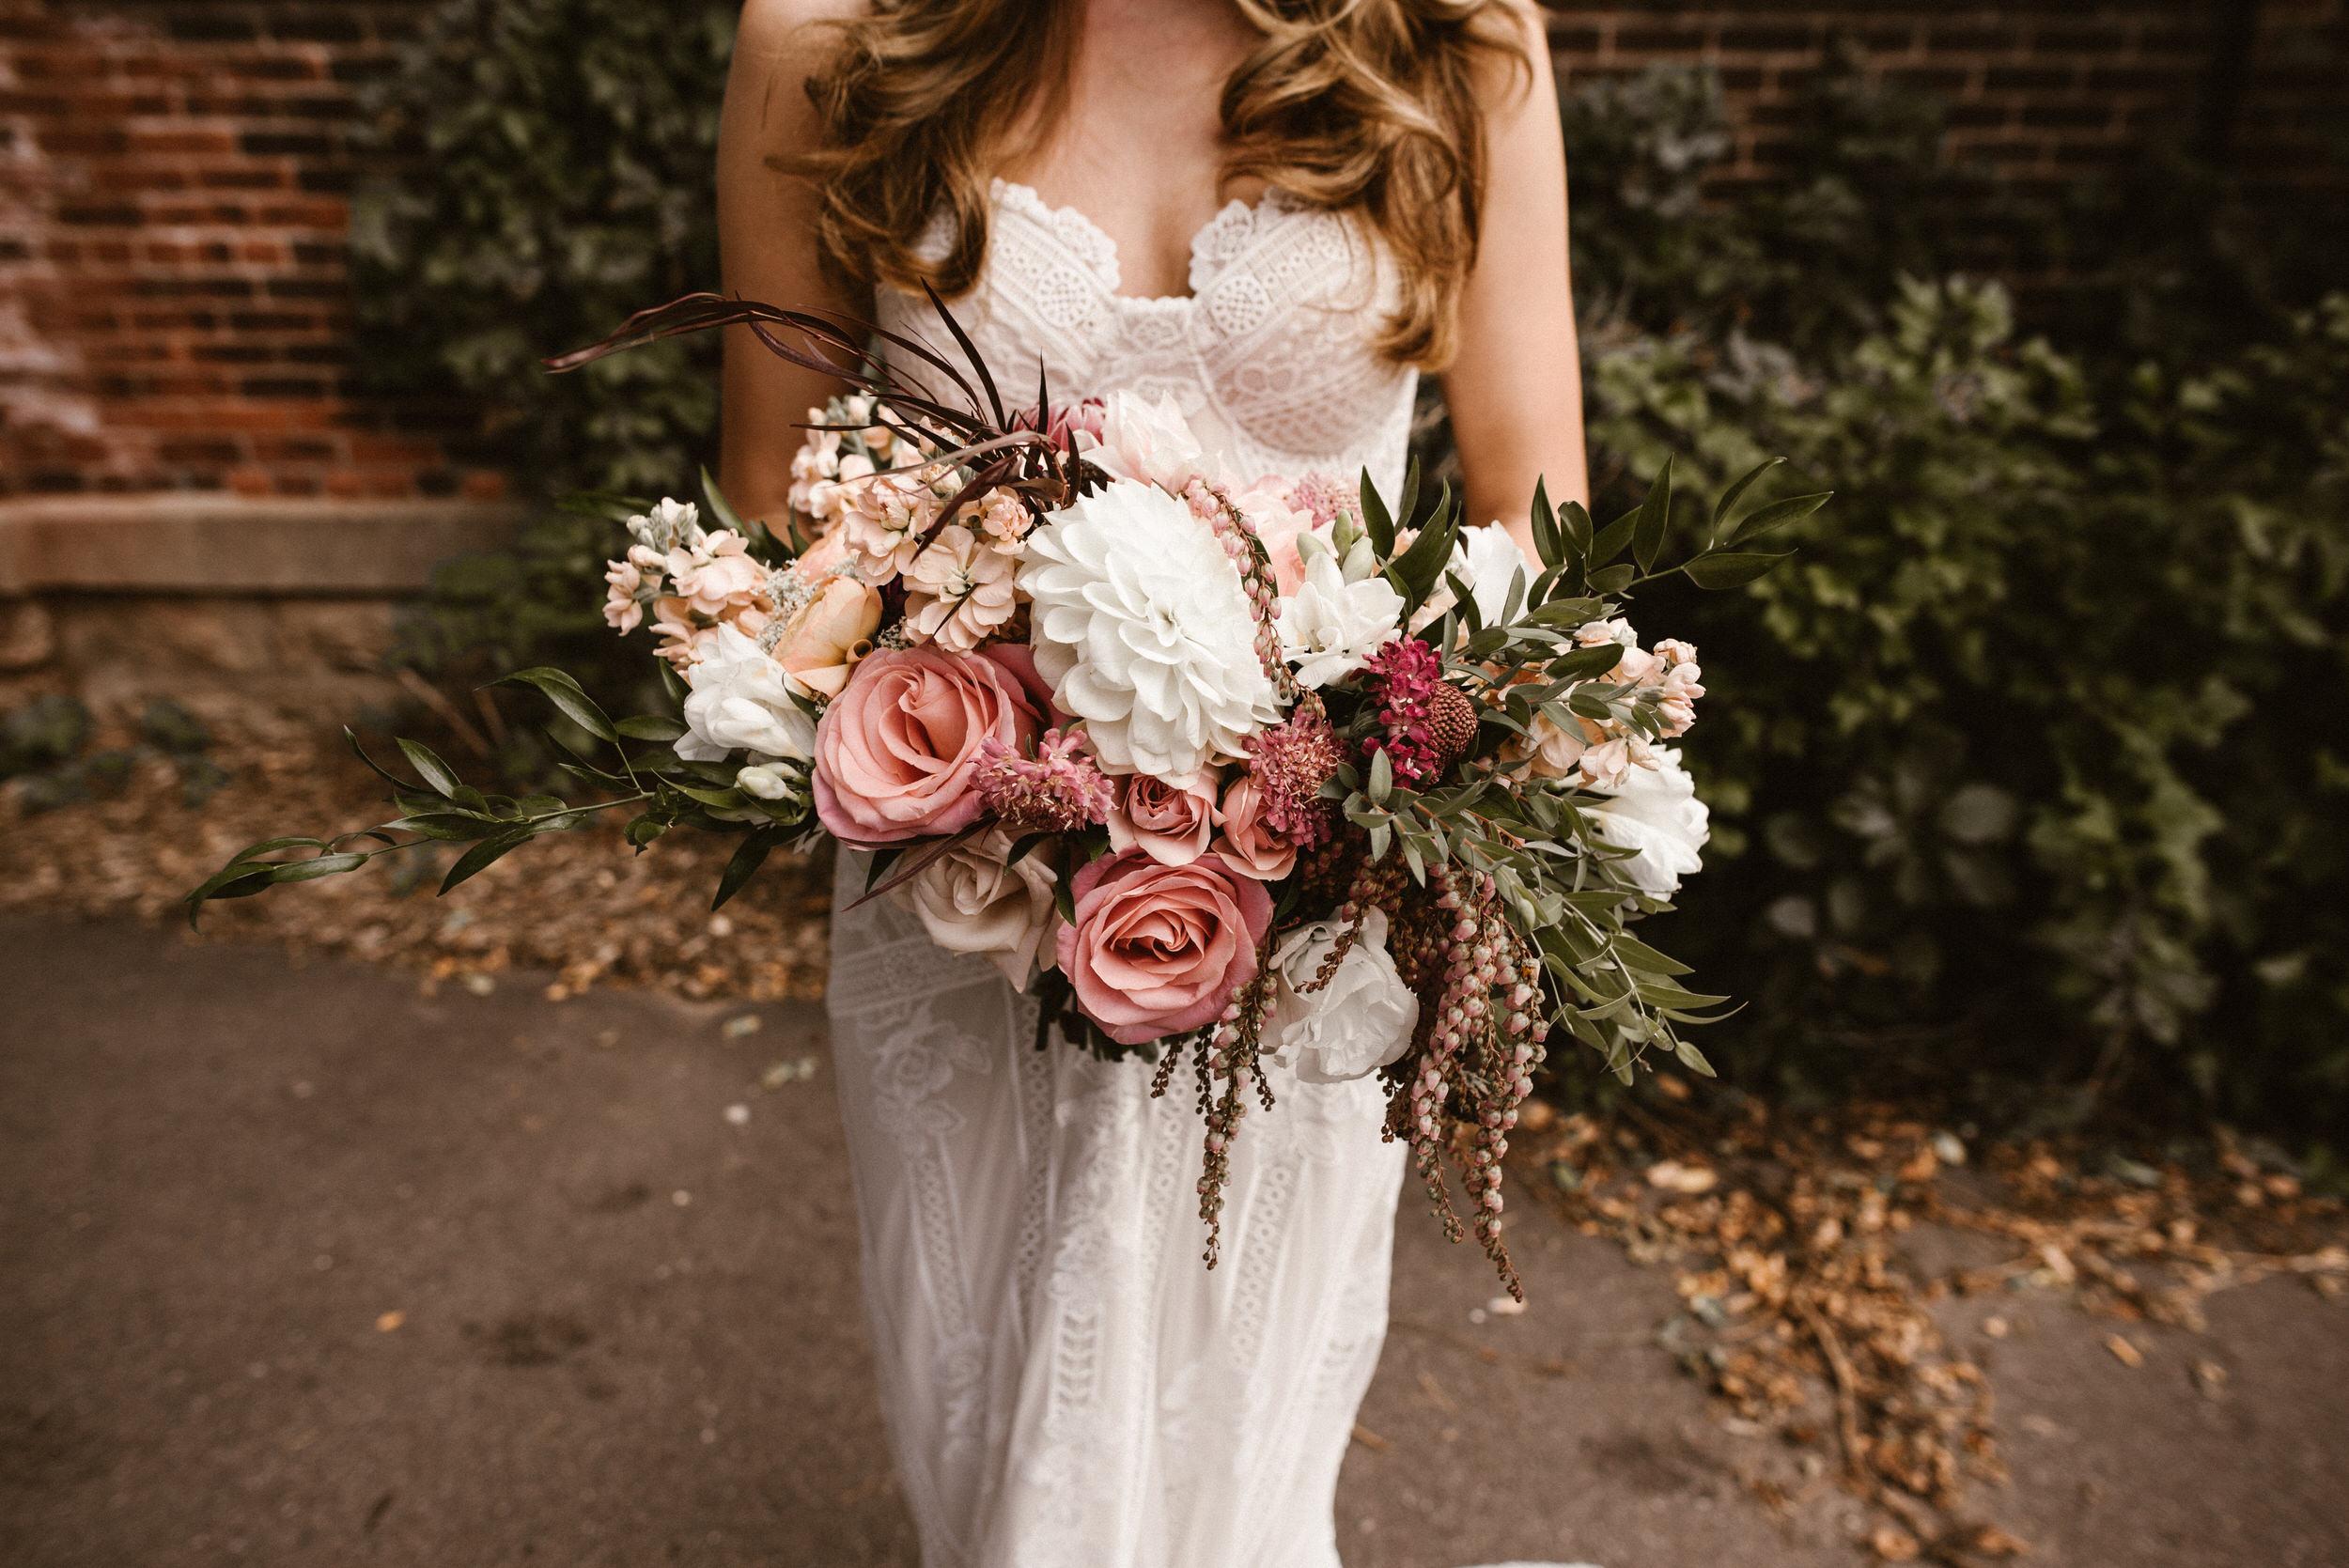 Stillwater-Minnesota-Wedding-Loft-at-Studio-J-Kaylie-Sirek-Photography-20.jpg